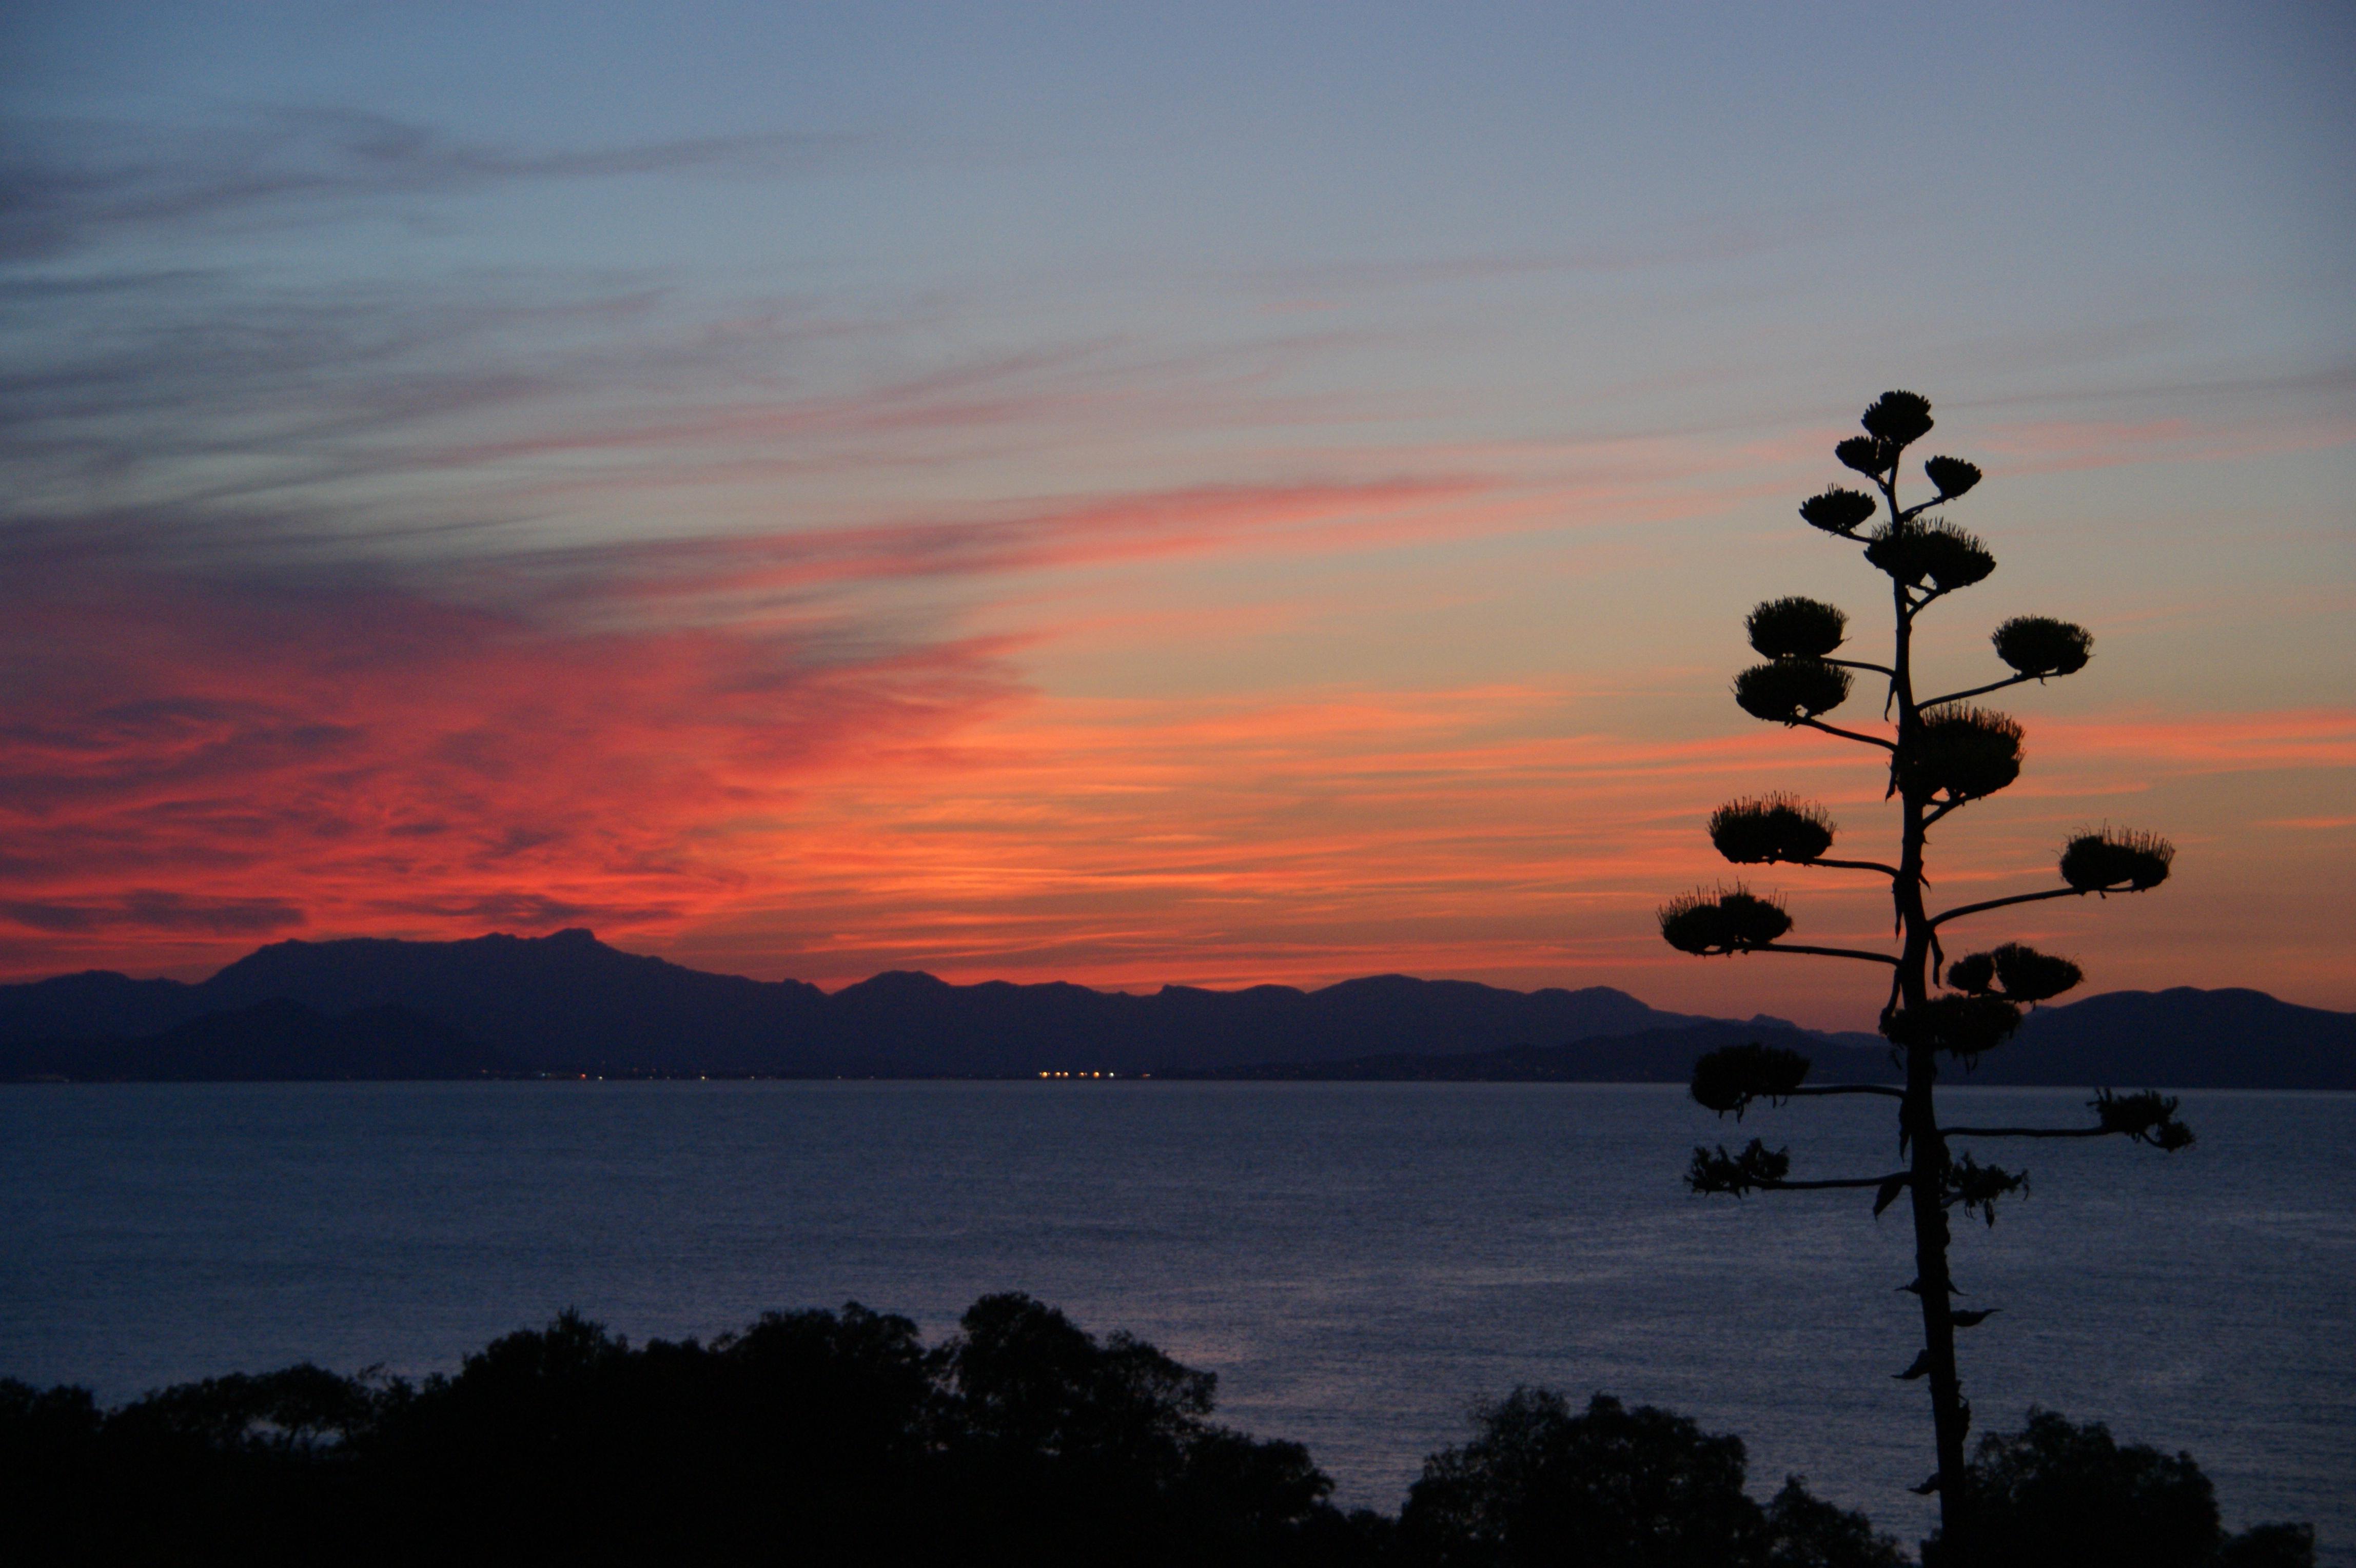 Abendhimmel / evening sky